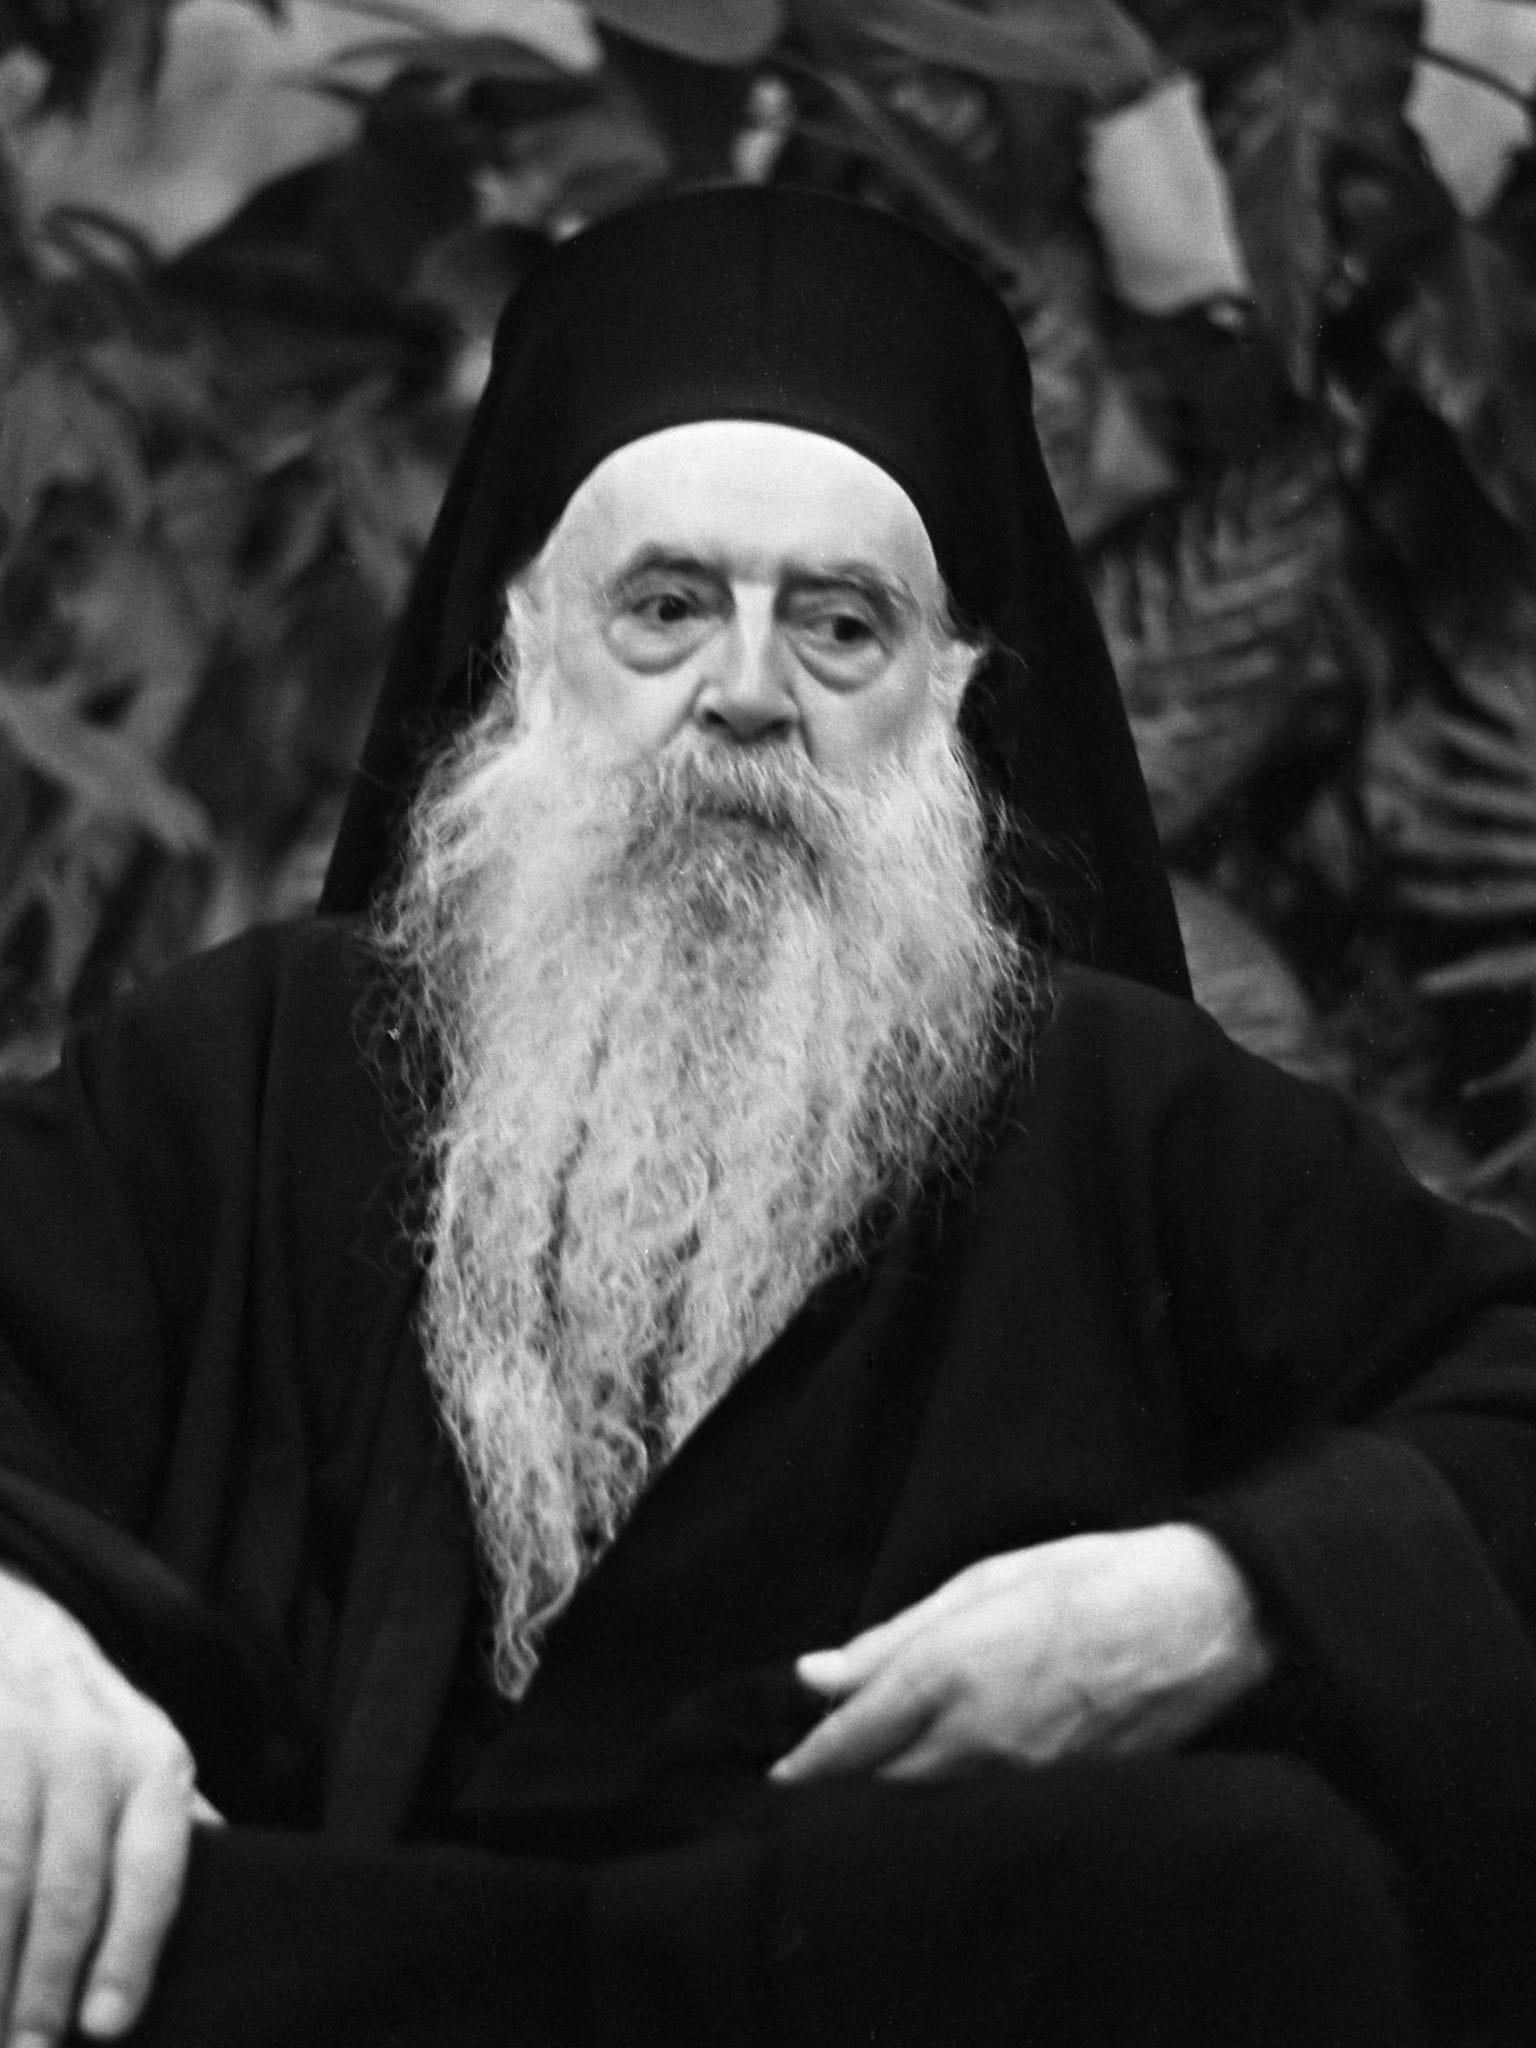 Aankomst Patriarch Athenagoras op Schiphol samen met Griekse reder Onassis  *25 oktober 1967